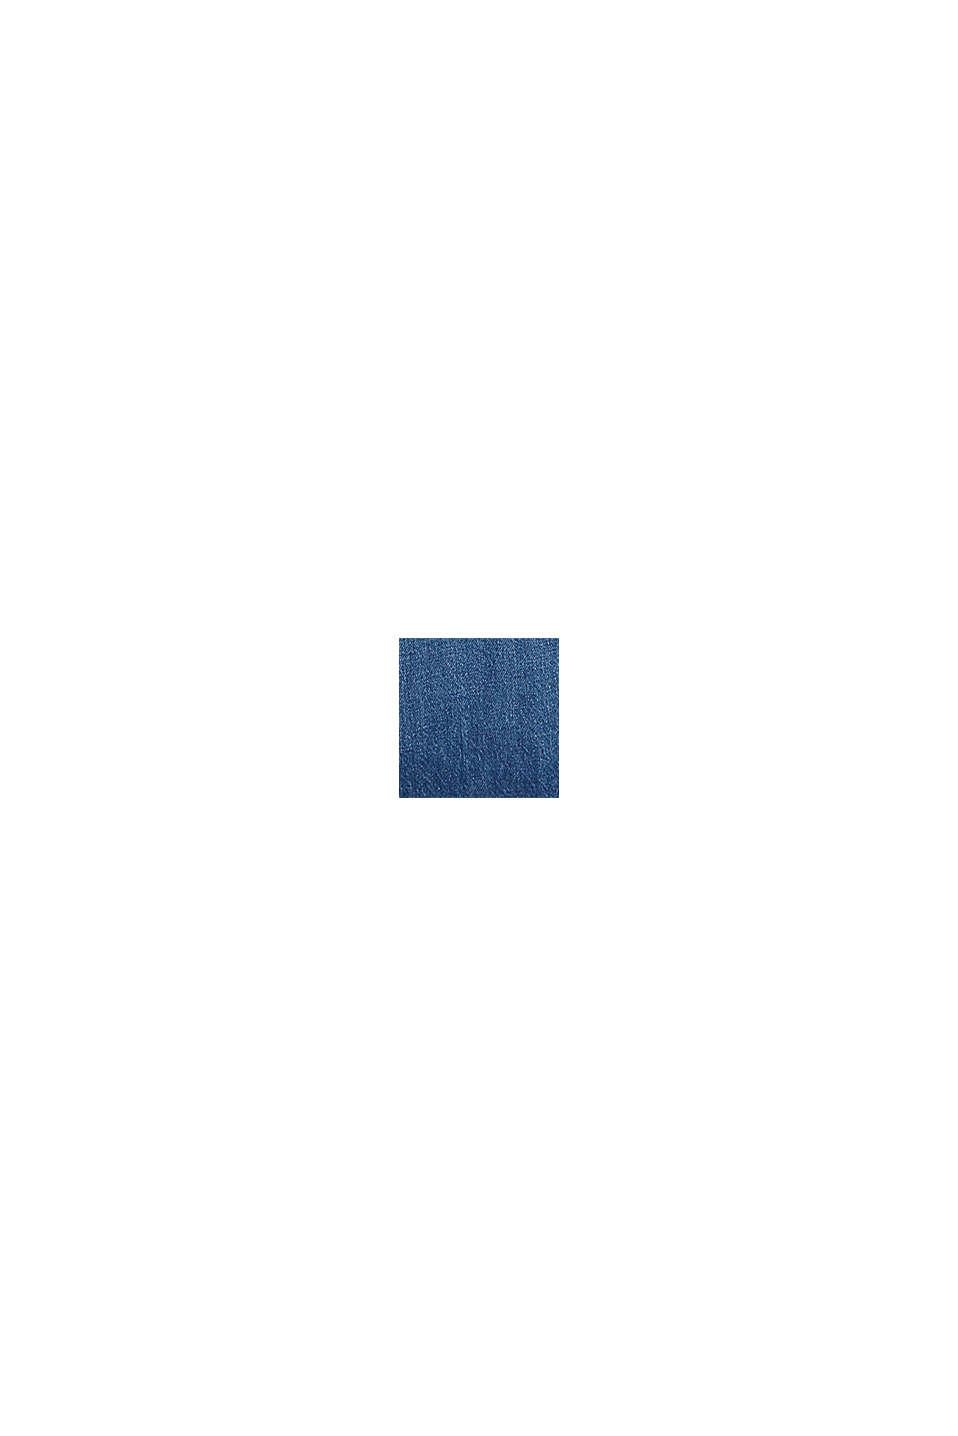 Denim culotte met opgestikte zakken, BLUE DARK WASHED, swatch